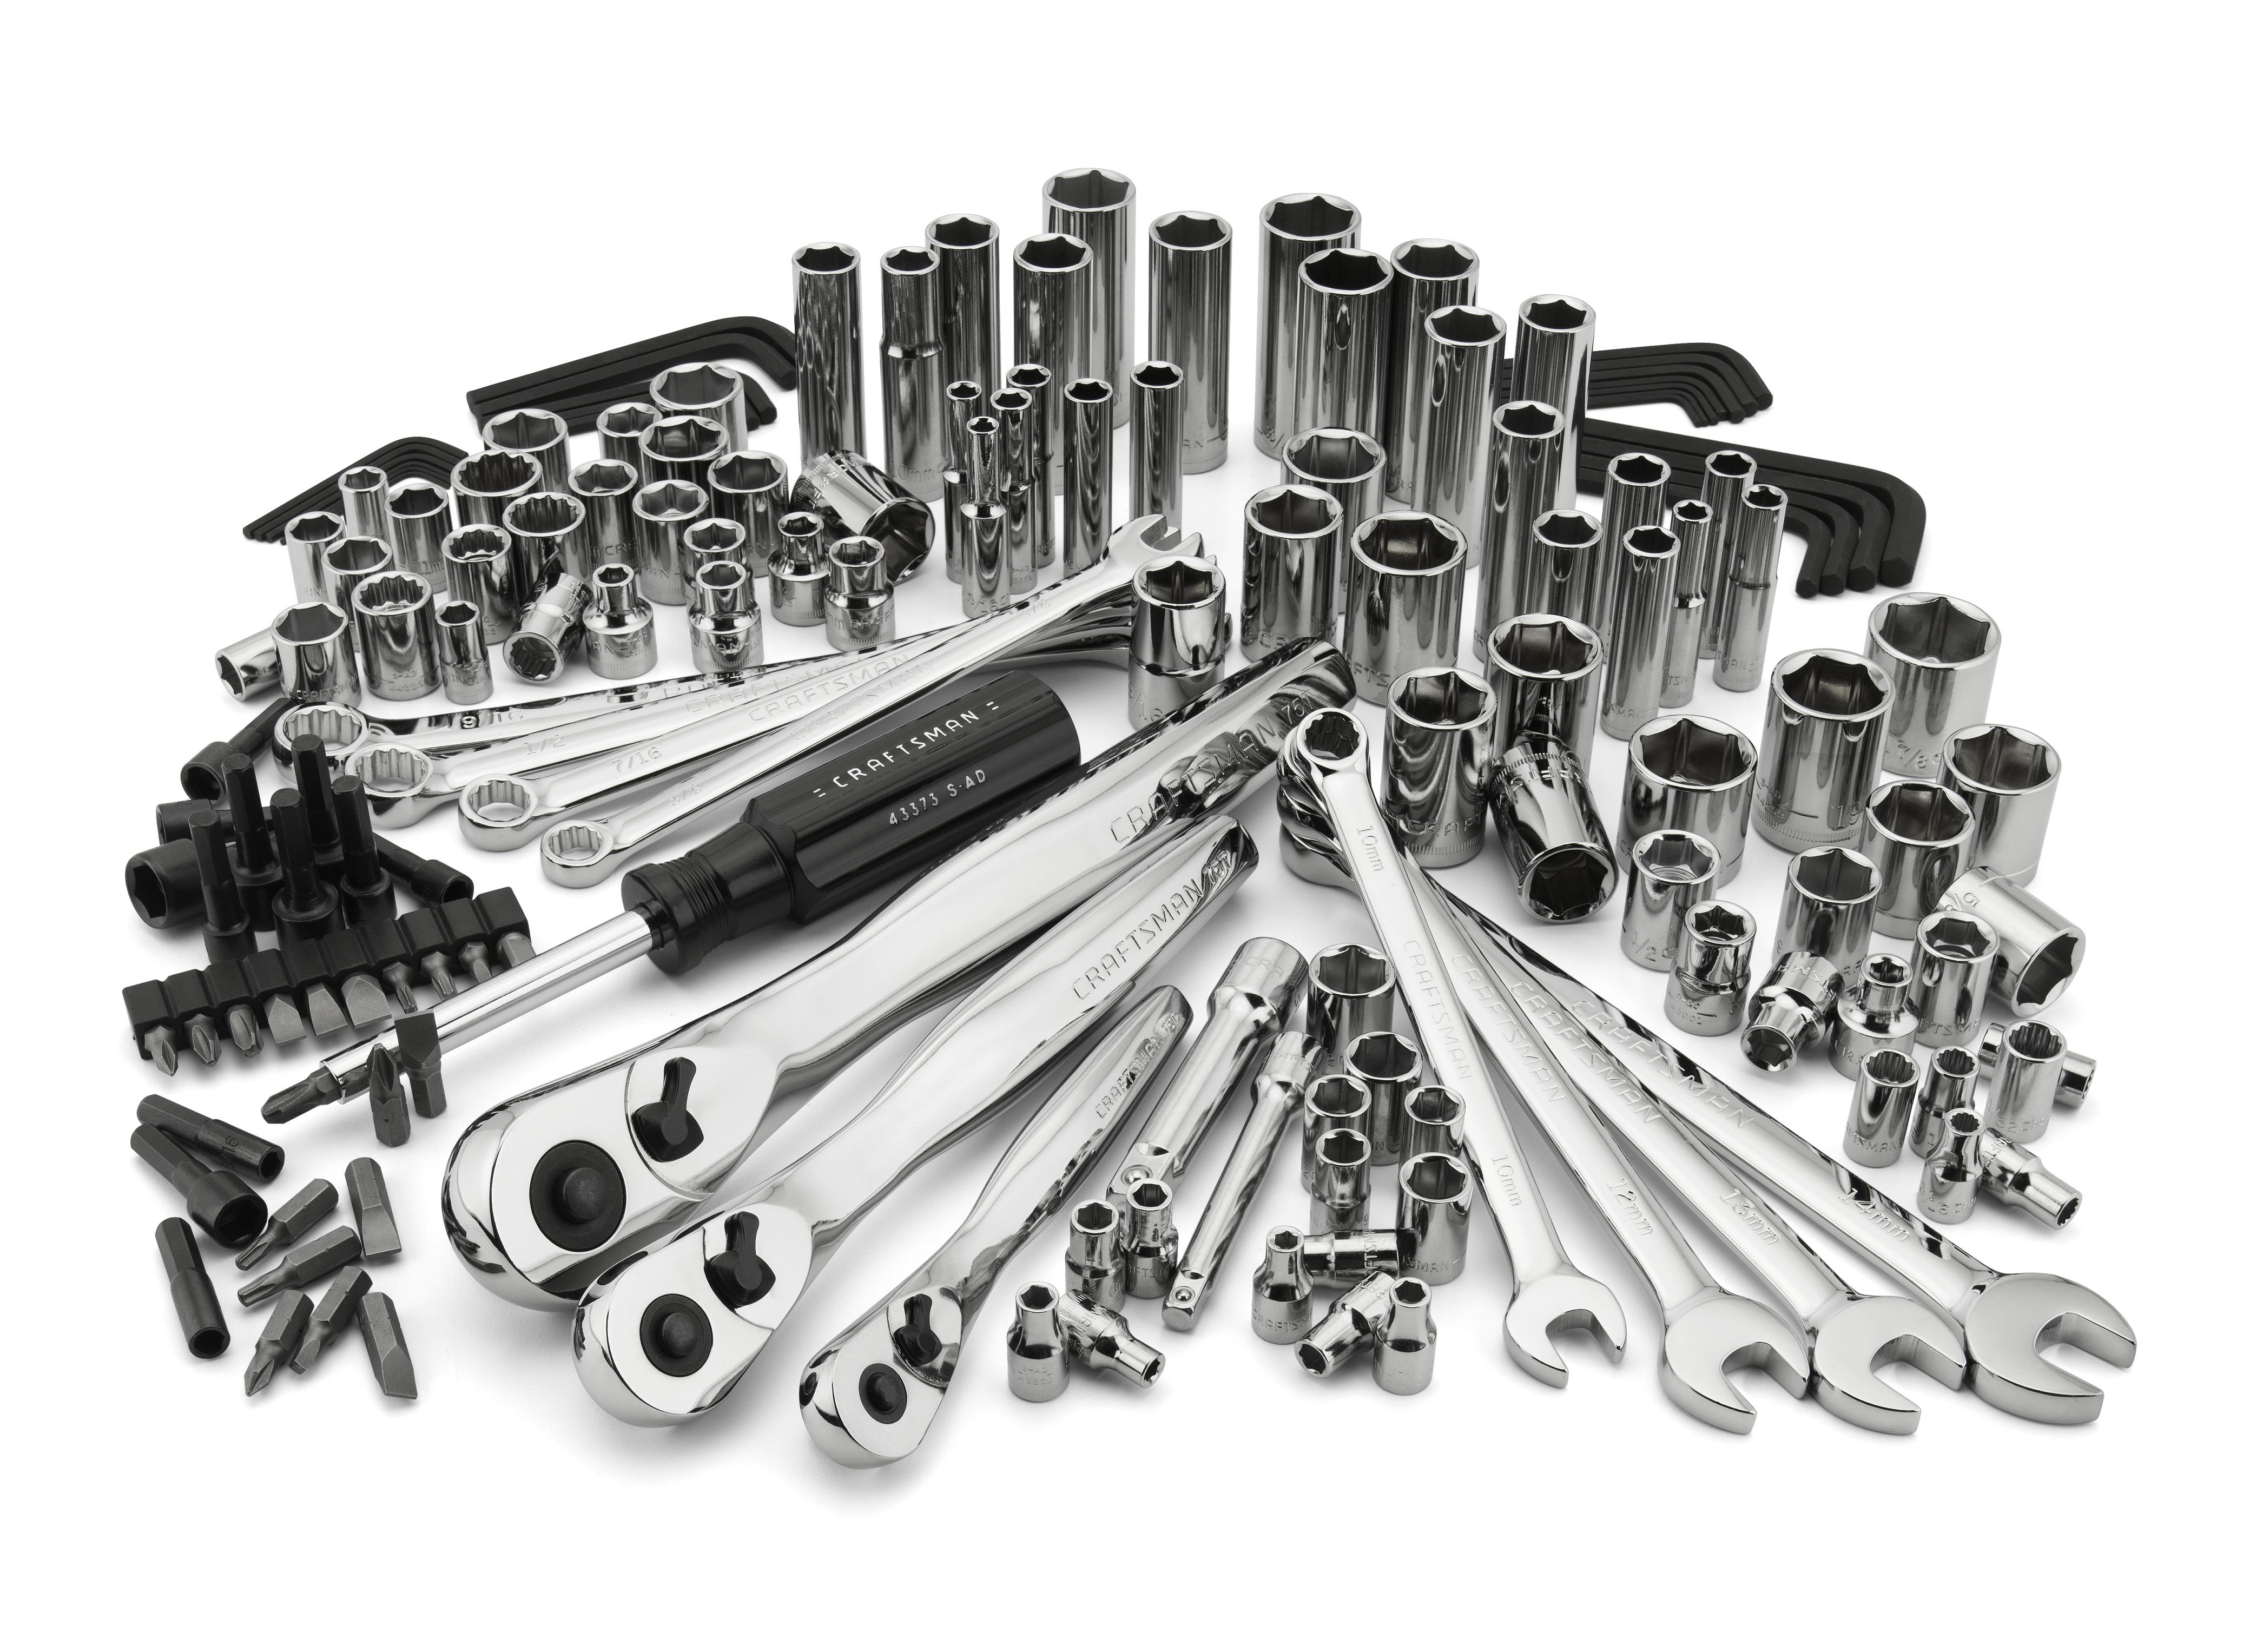 Craftsman 155pc Mechanics Tool Set